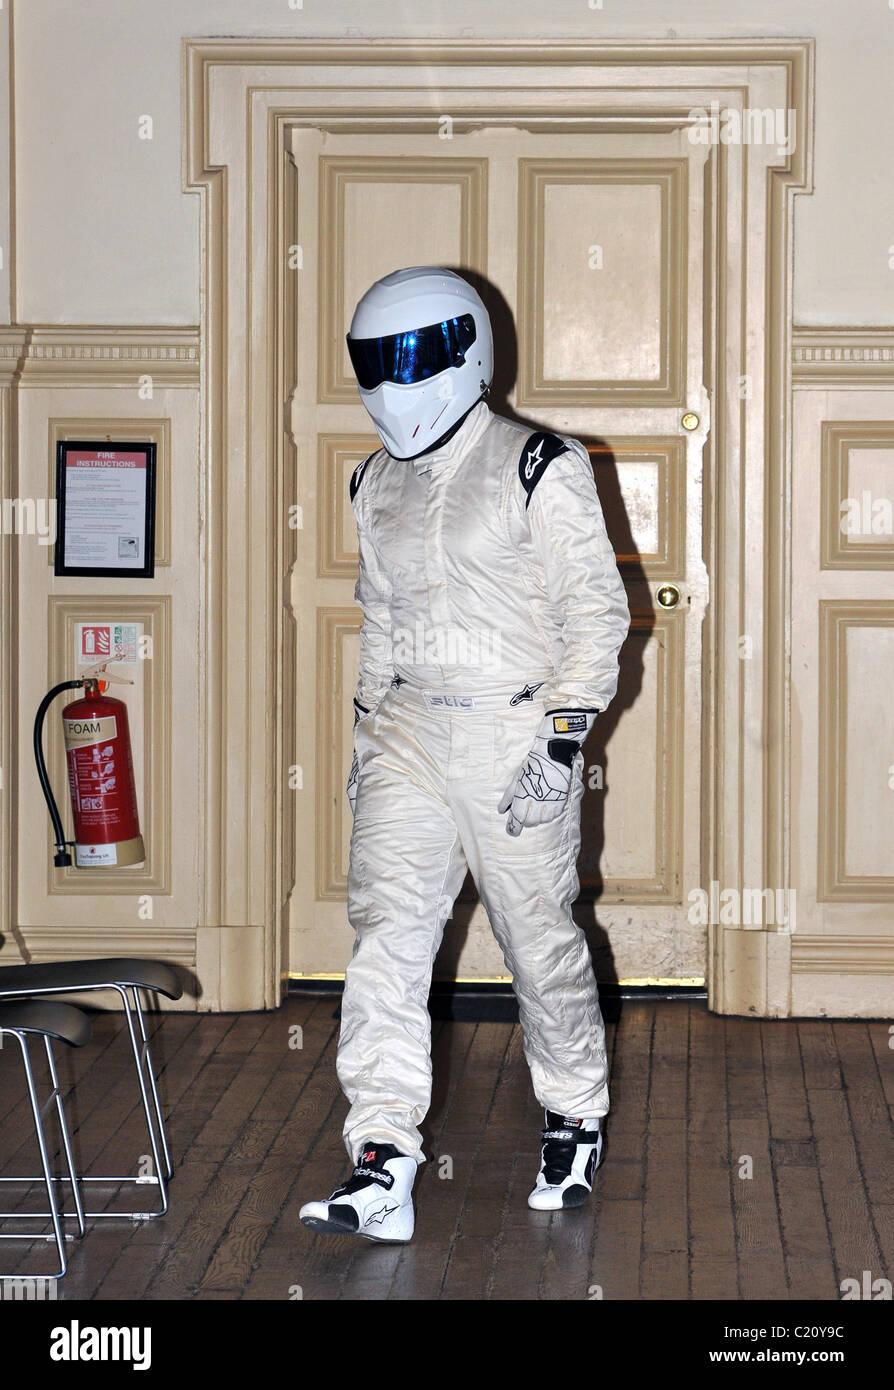 The Stig Top Gear Costume